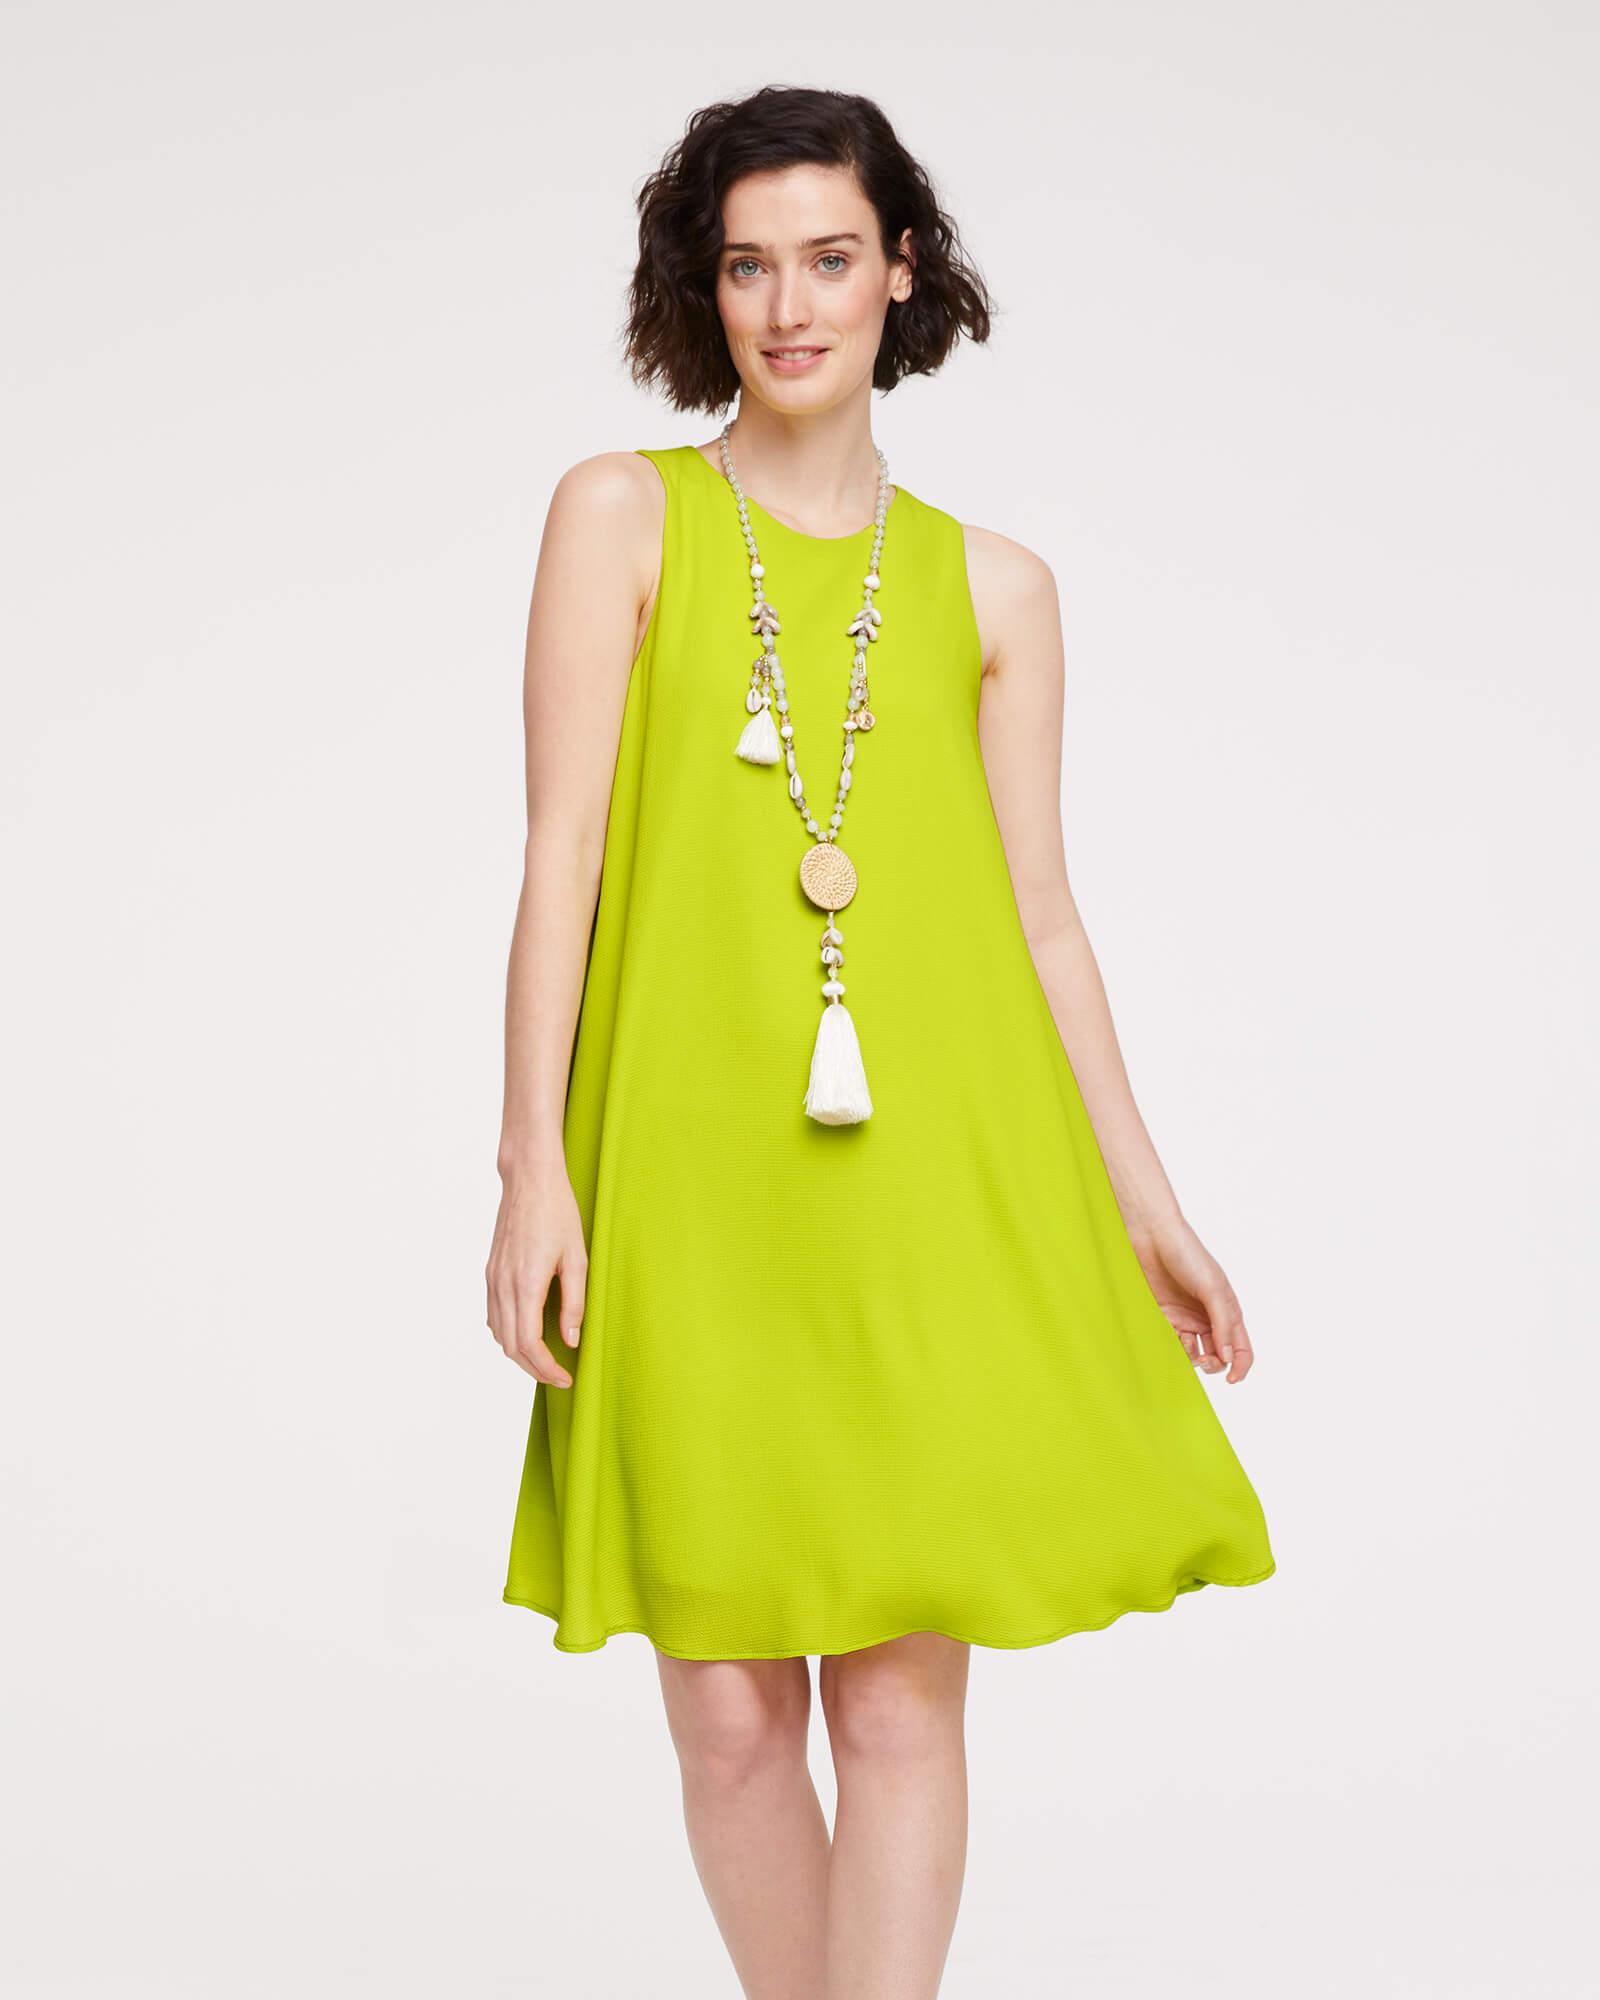 Kurzes Frühlingskleid in Limone